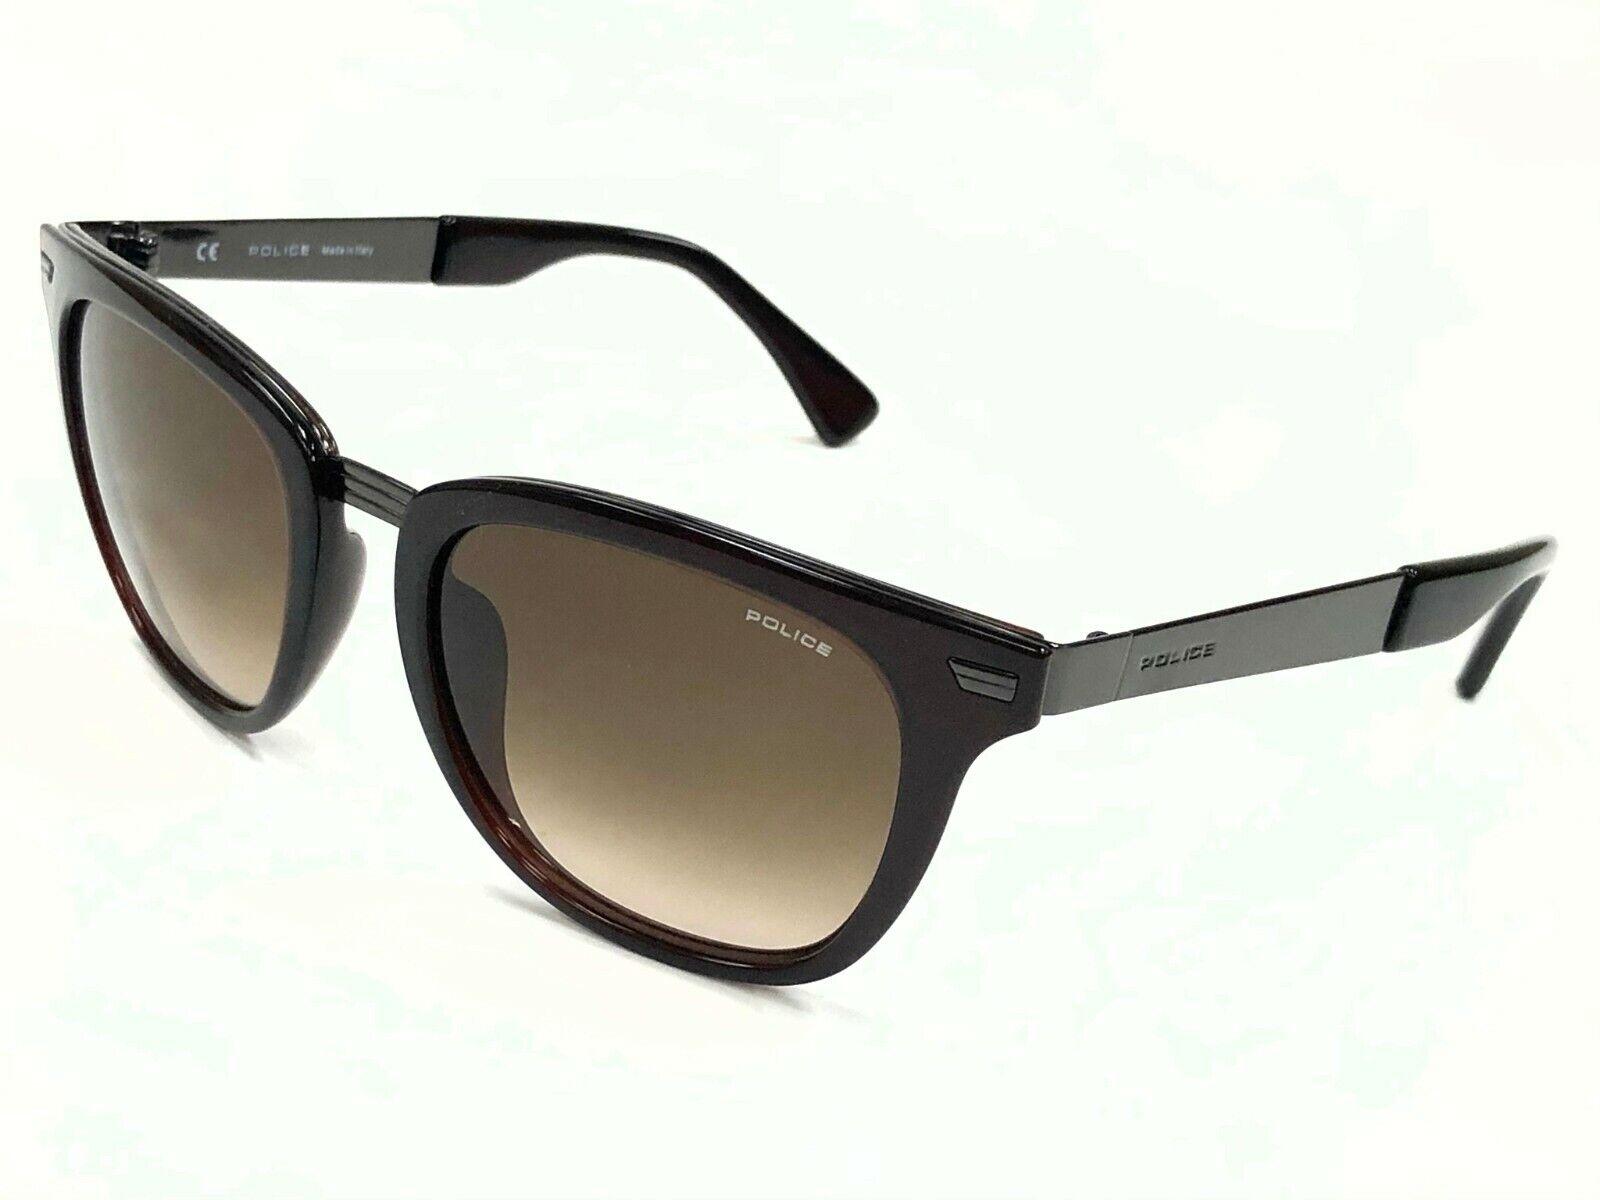 Authentic POLICE CUBE 2 S8749 0Z90 Brown Ruthenium/Brown Lens 52mm Sunglasses